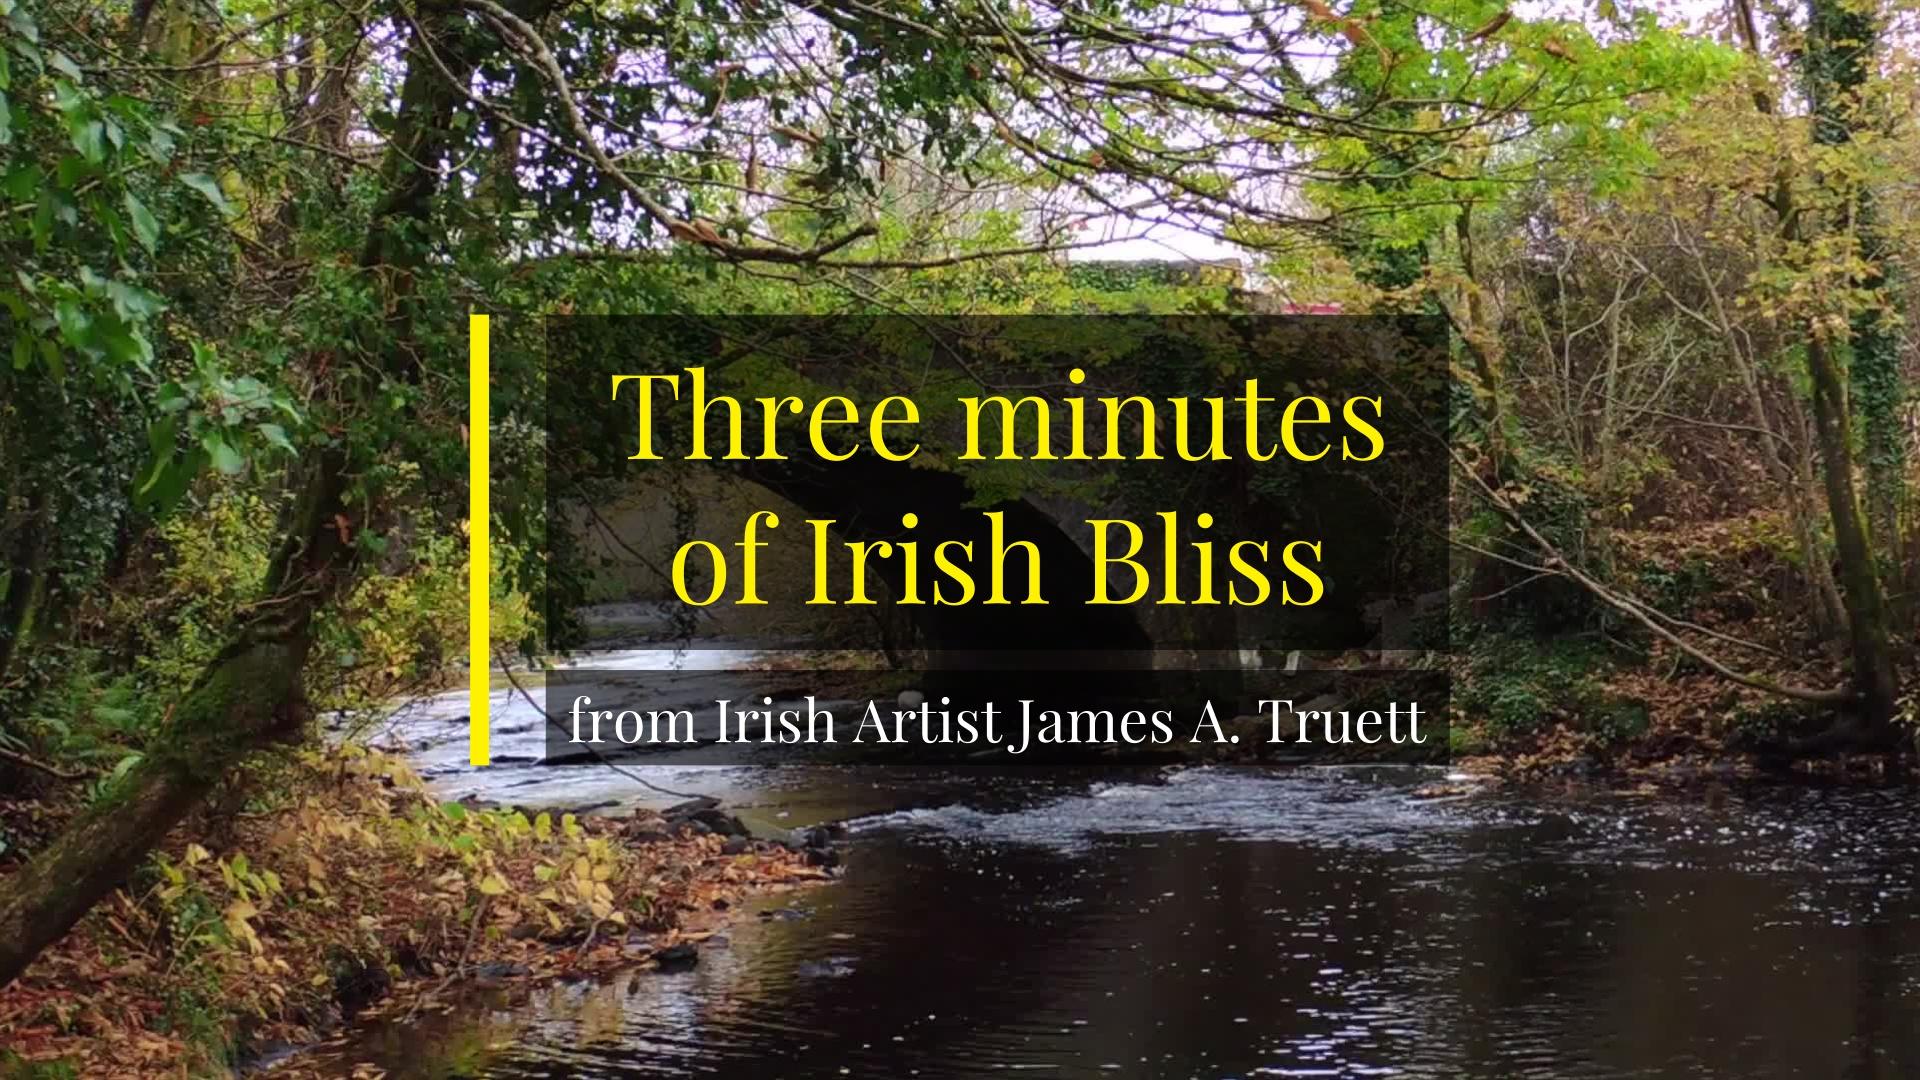 Three Minutes of Irish Bliss